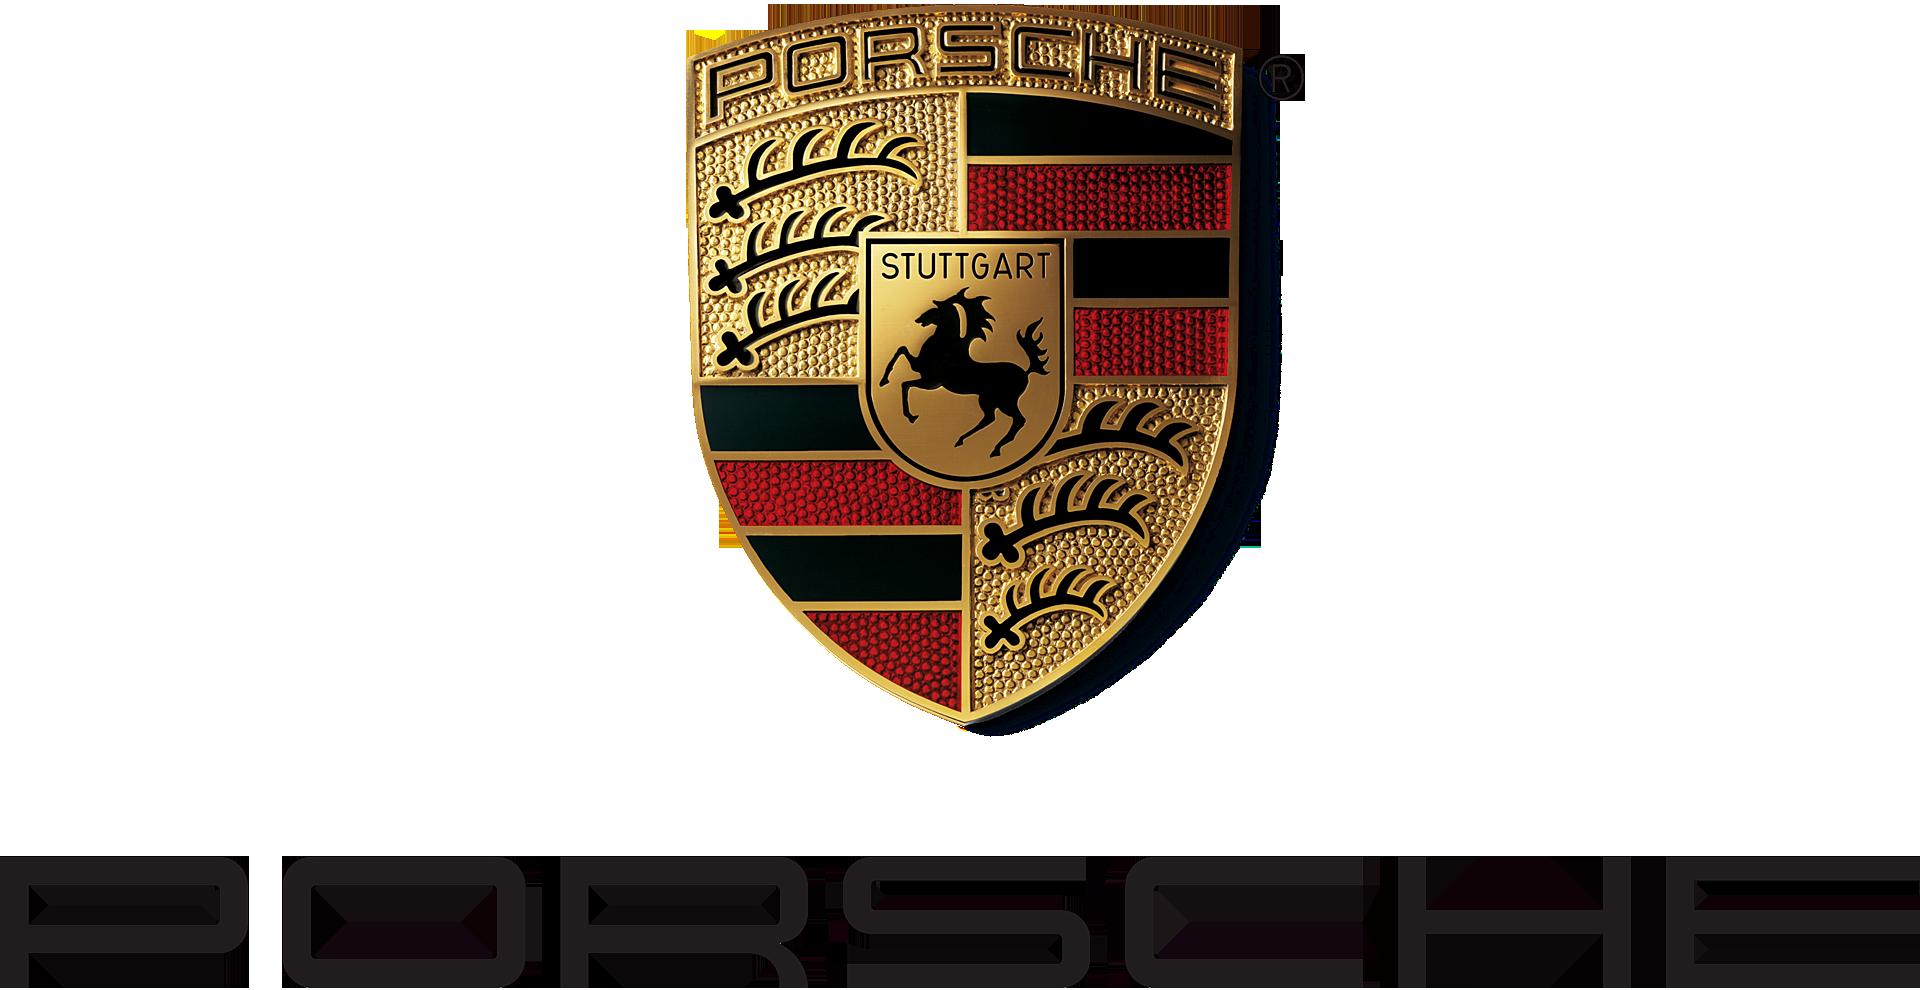 Porsche Wikipedia